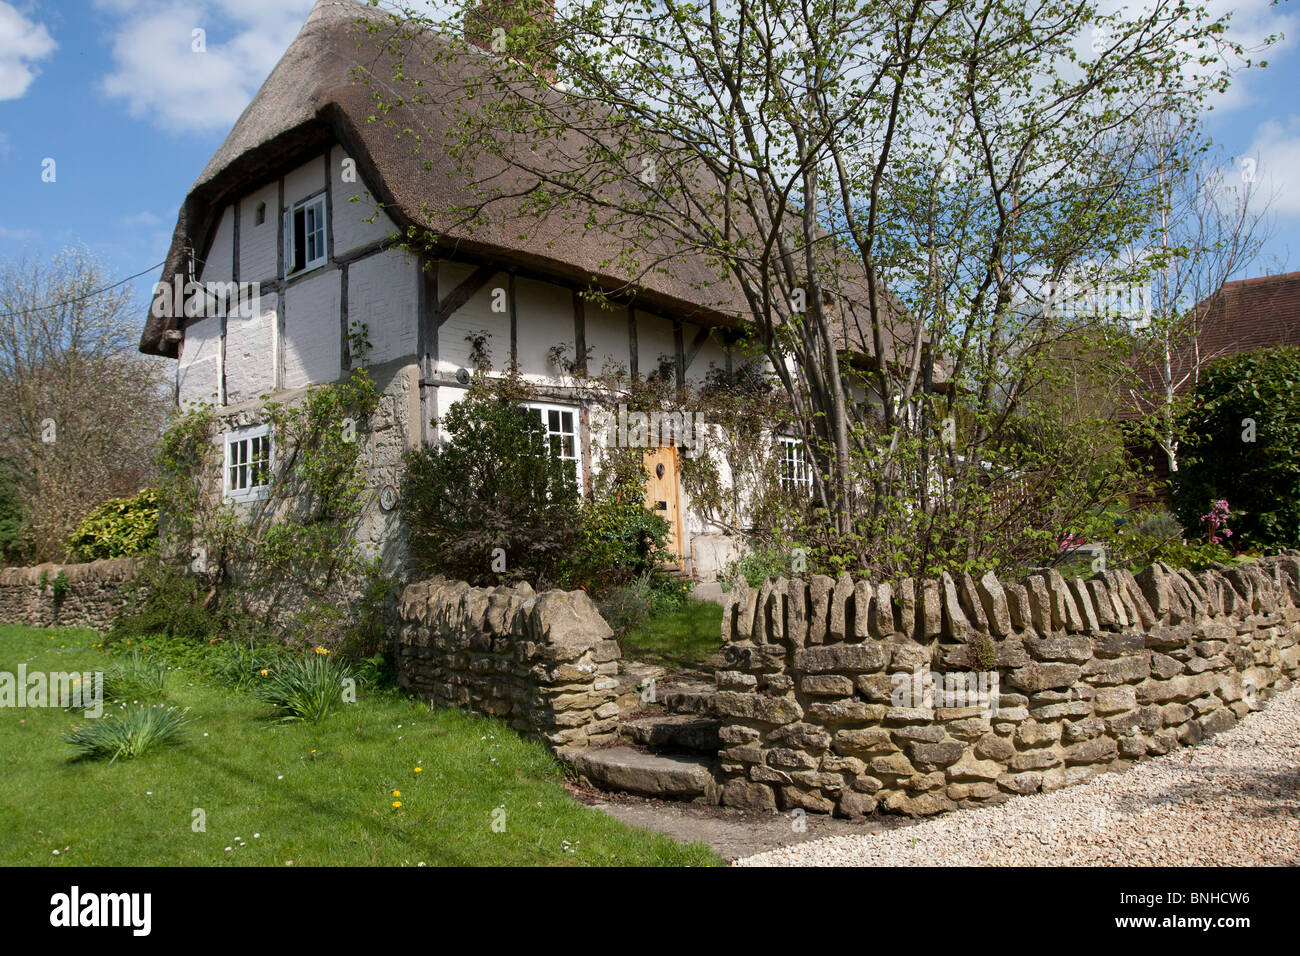 Garsington Village, Oxford UK - Stock Image